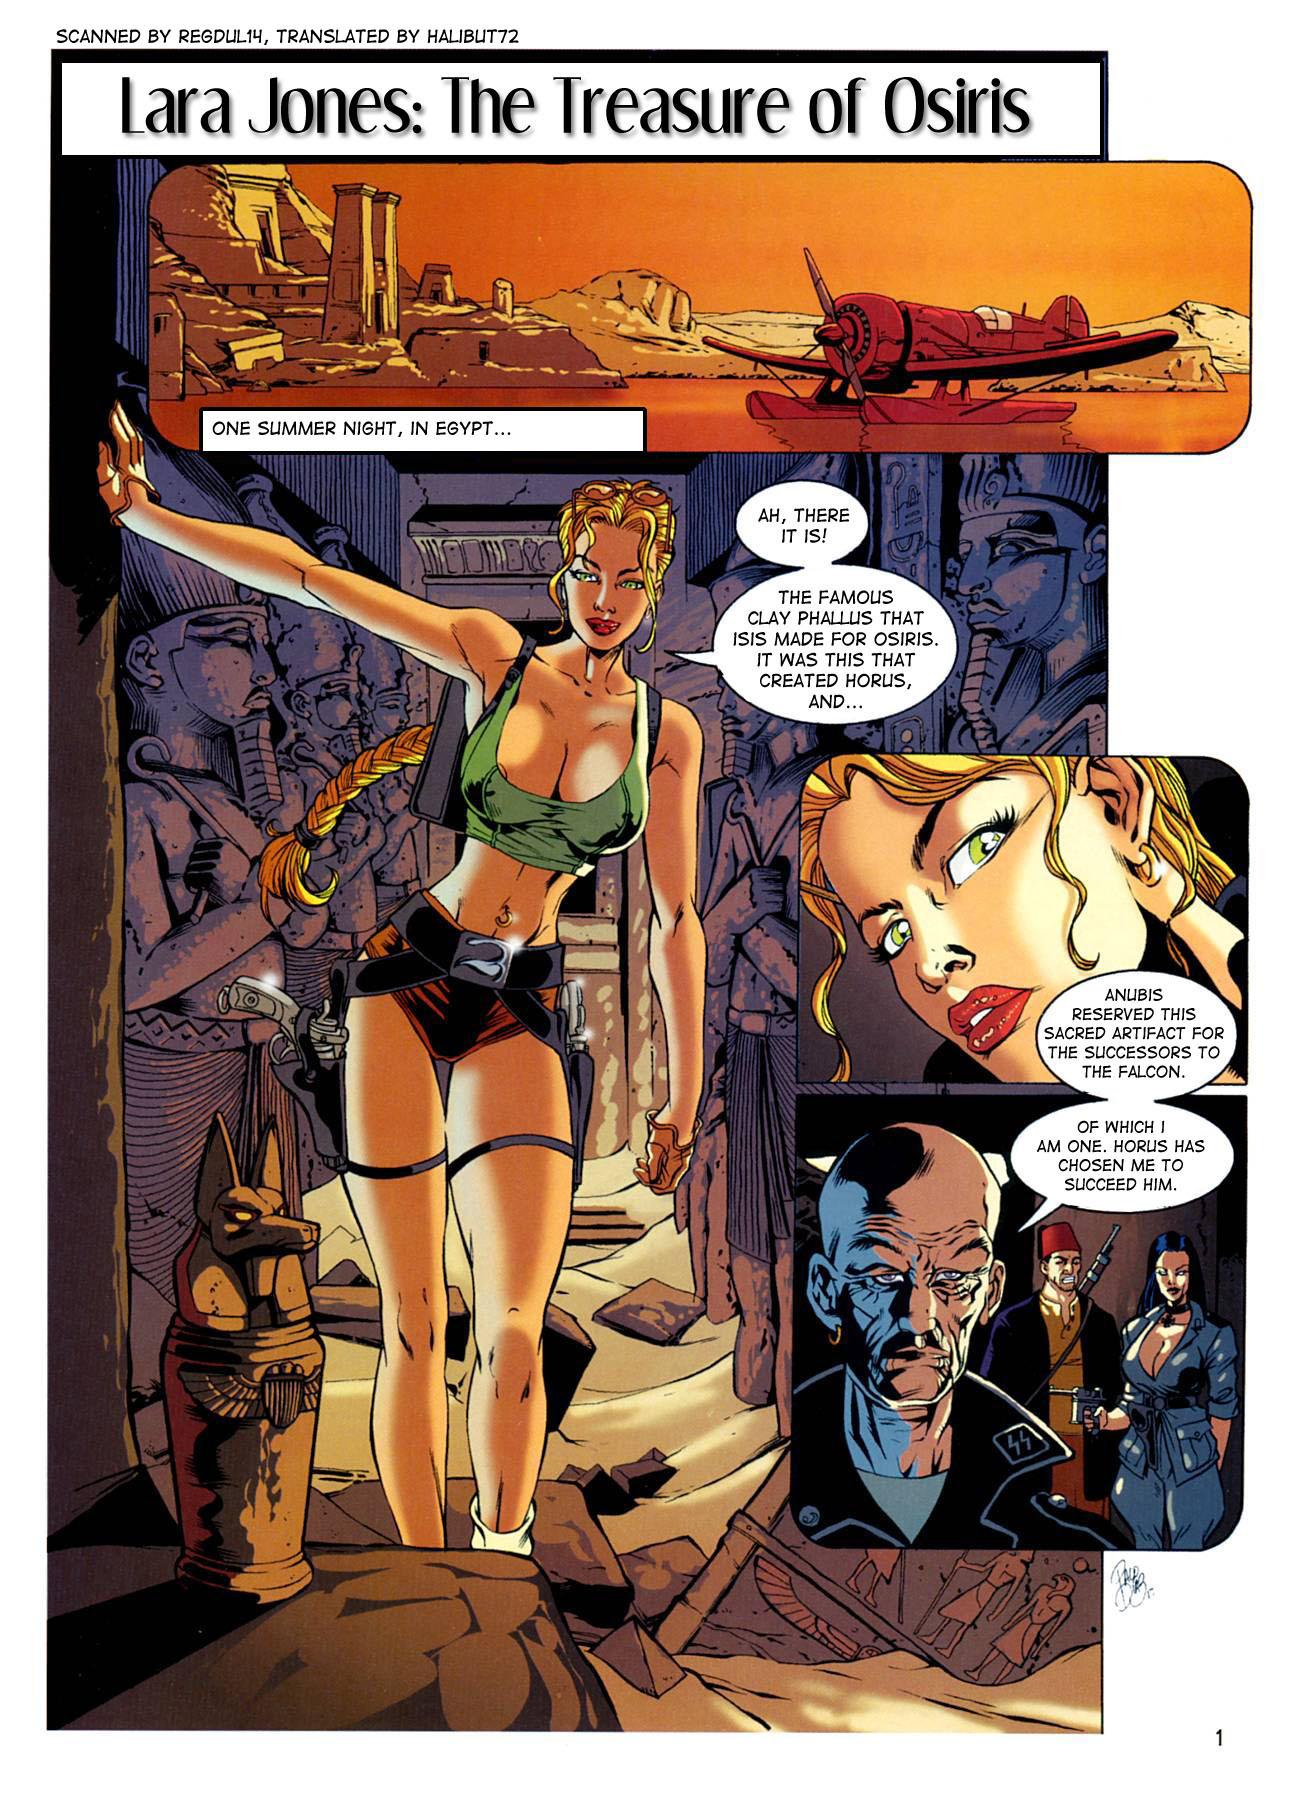 Porn Comics - The Treasure of Osiris- Lara Jones porn comics 8 muses